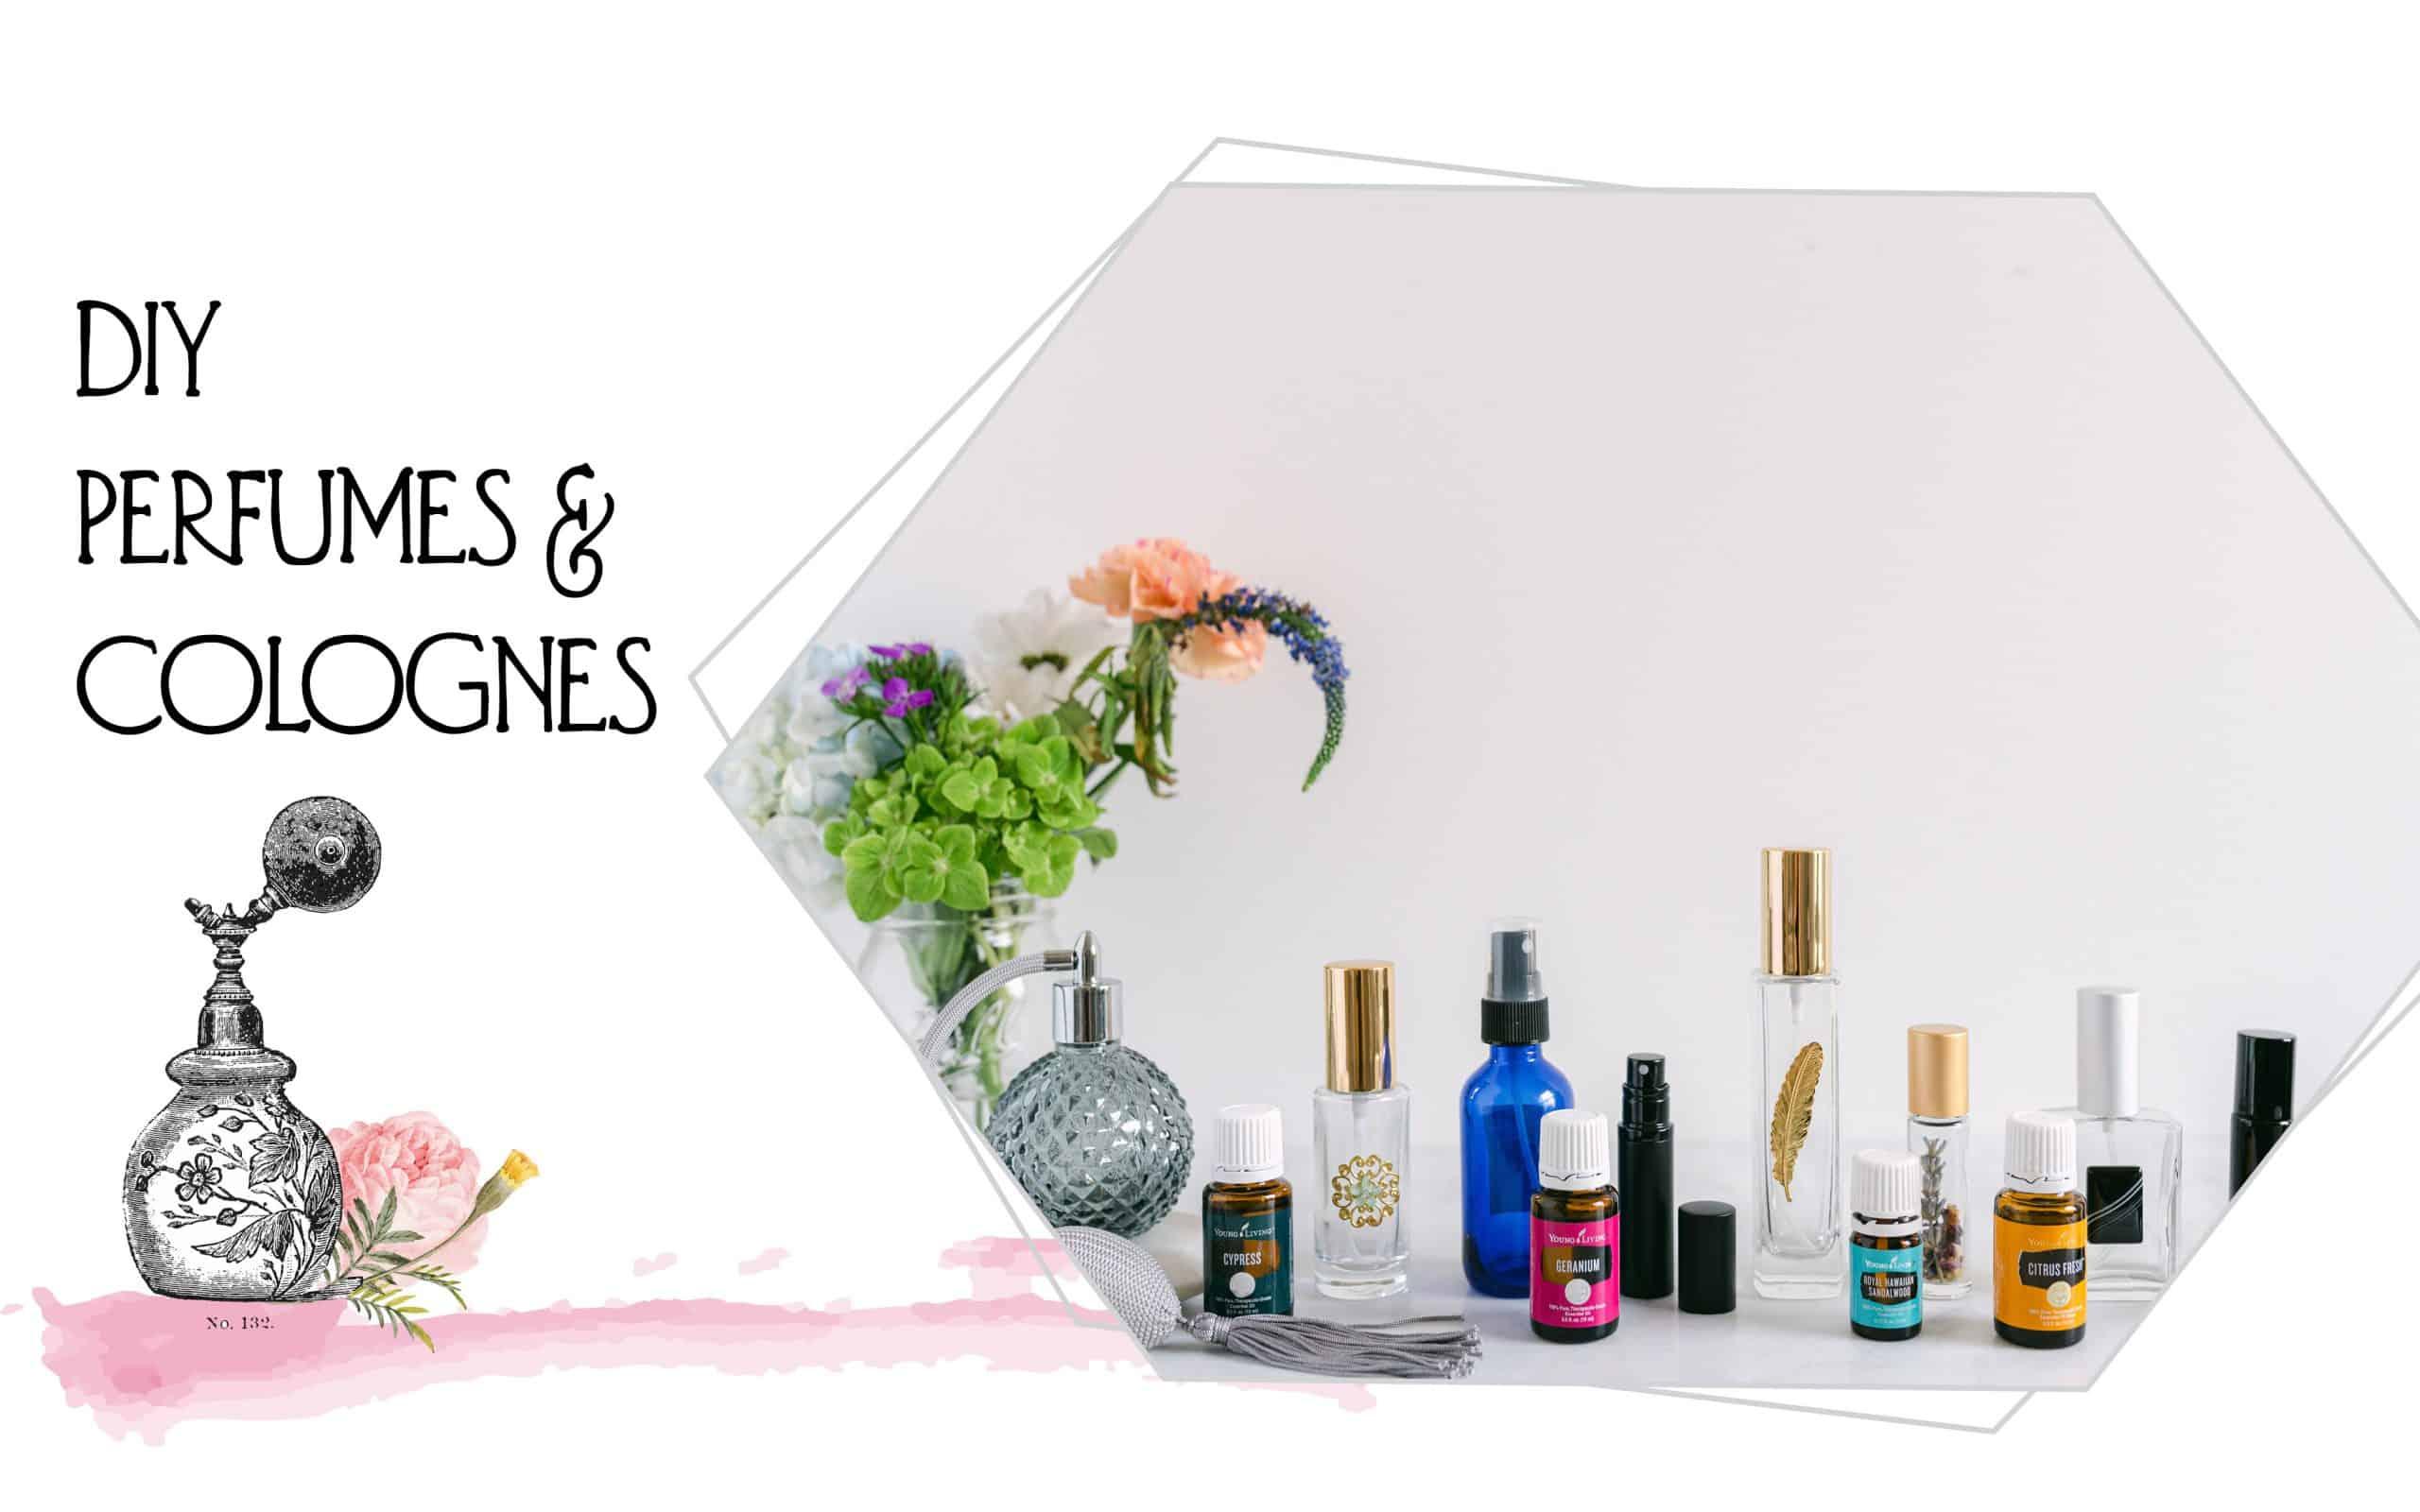 Photo of perfume bottles on a white background